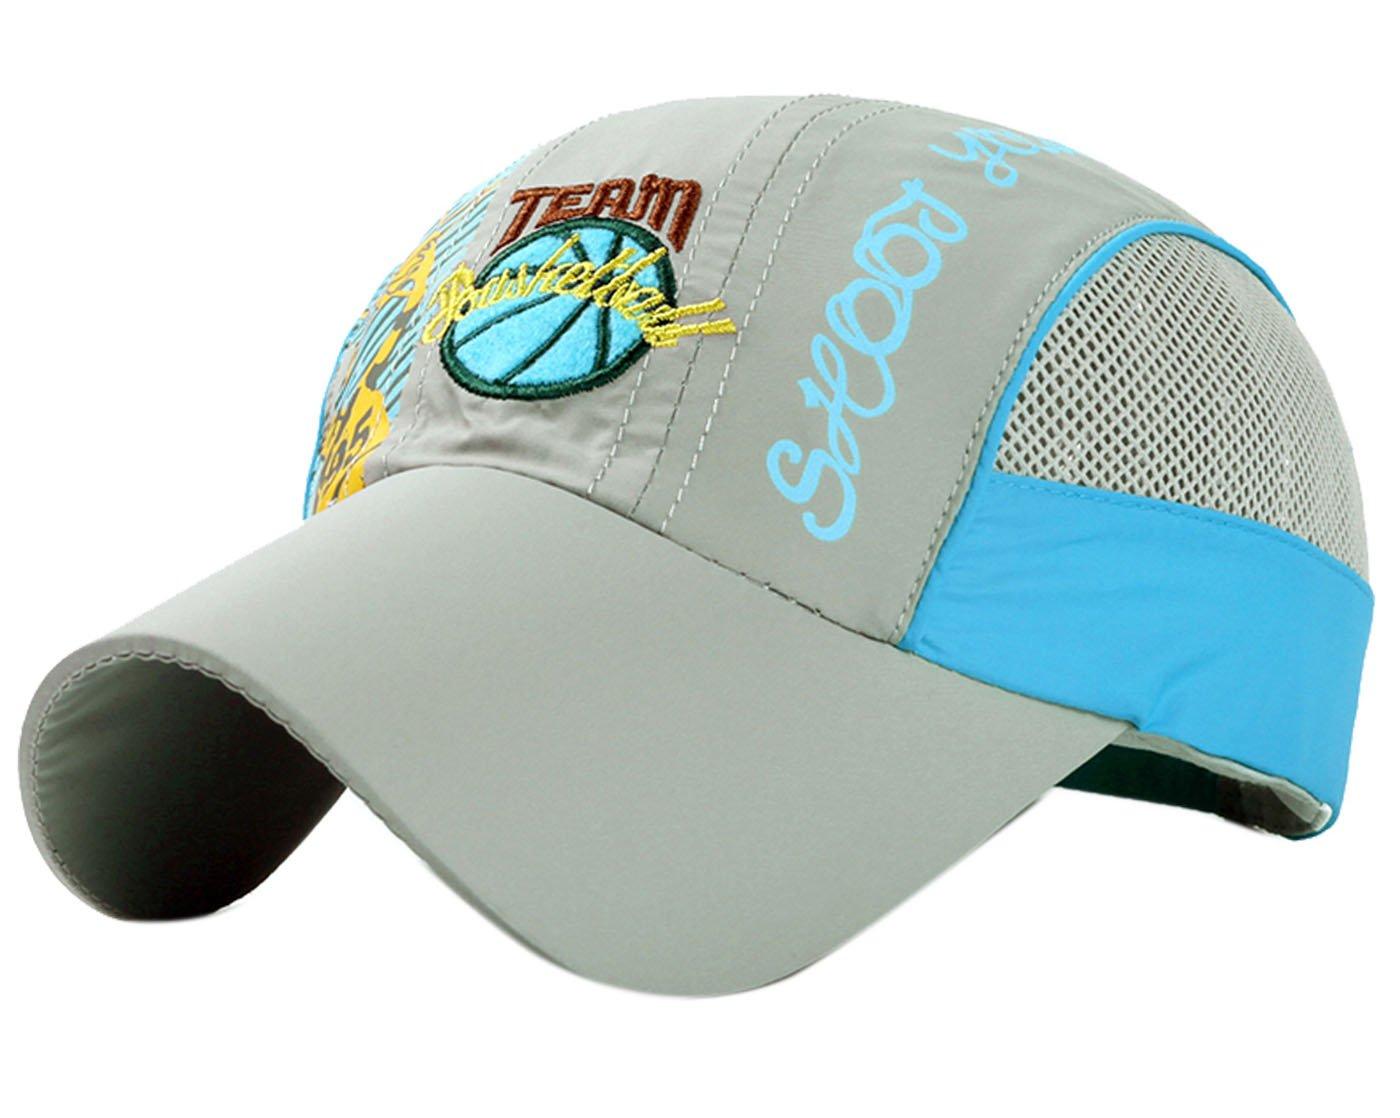 Panegy Lightweight Hat for Kids Toddler Cotton Quick Dry Sun Hat Baseball Cap Grey